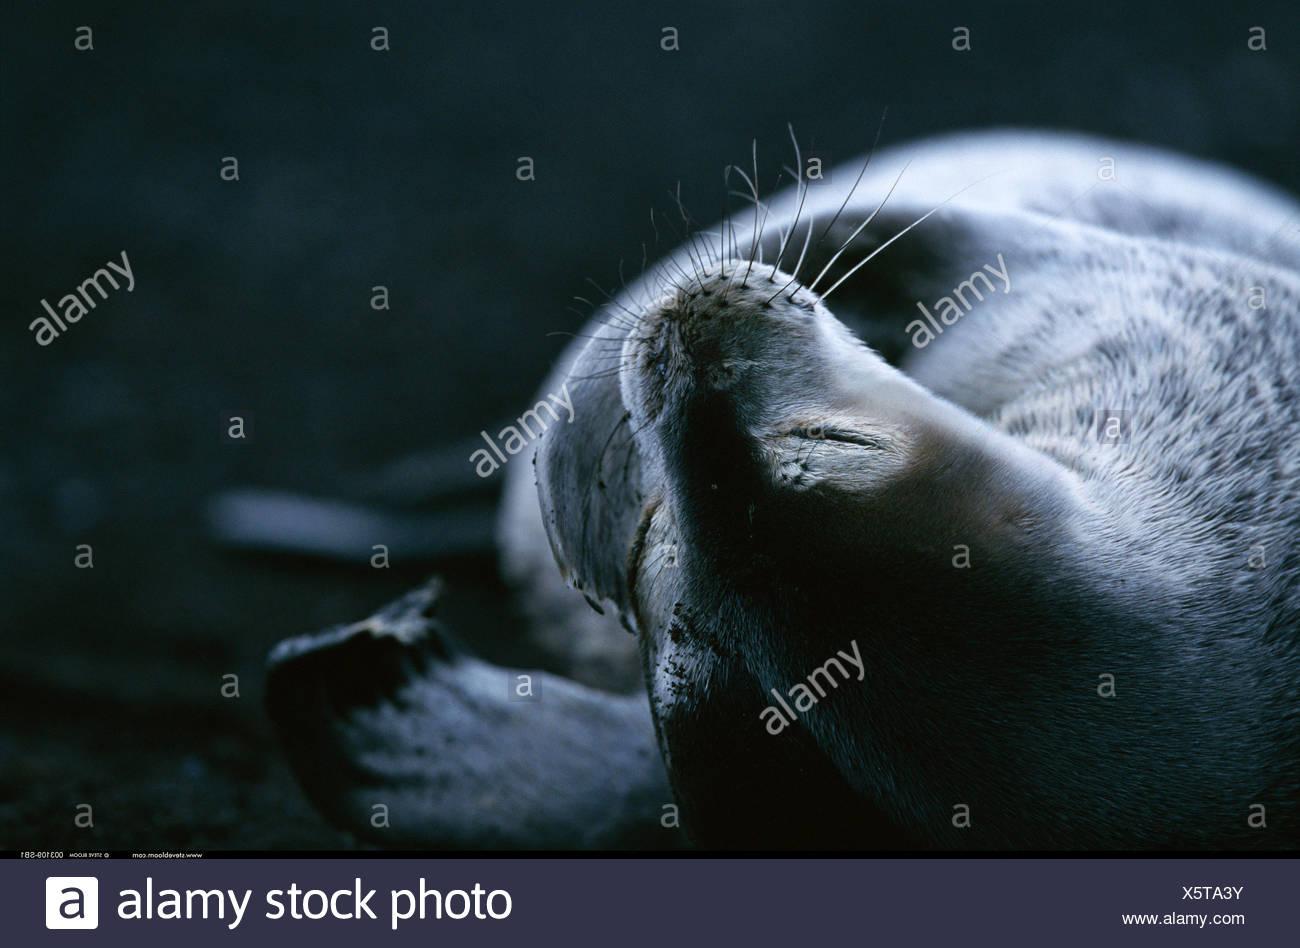 Fur seal Deception Island Antarctica - Stock Image